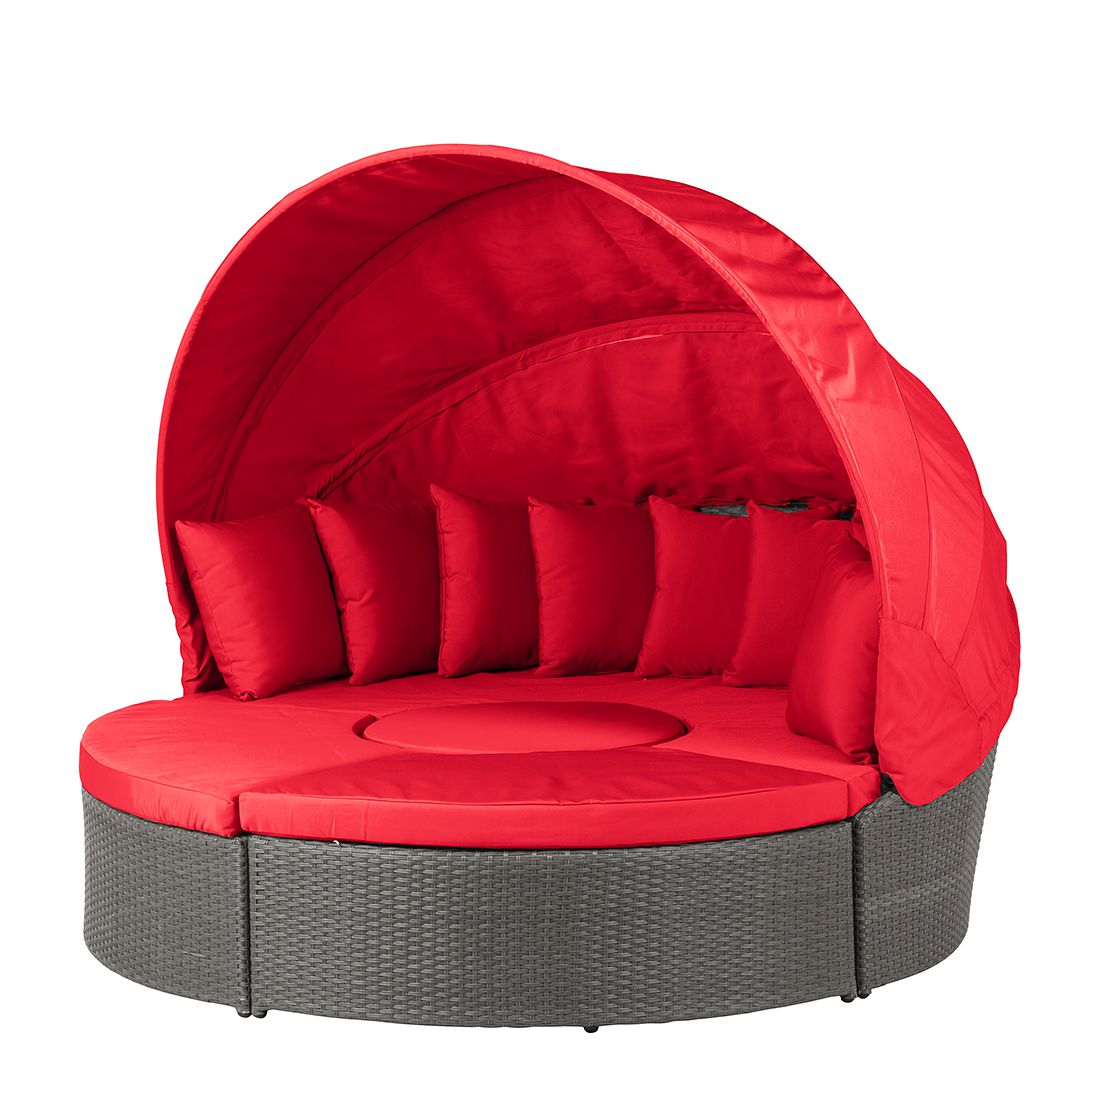 premium sonneninsel paradise lounge polyrattan aluminiumrahmen grau rot fredriks kaufen. Black Bedroom Furniture Sets. Home Design Ideas